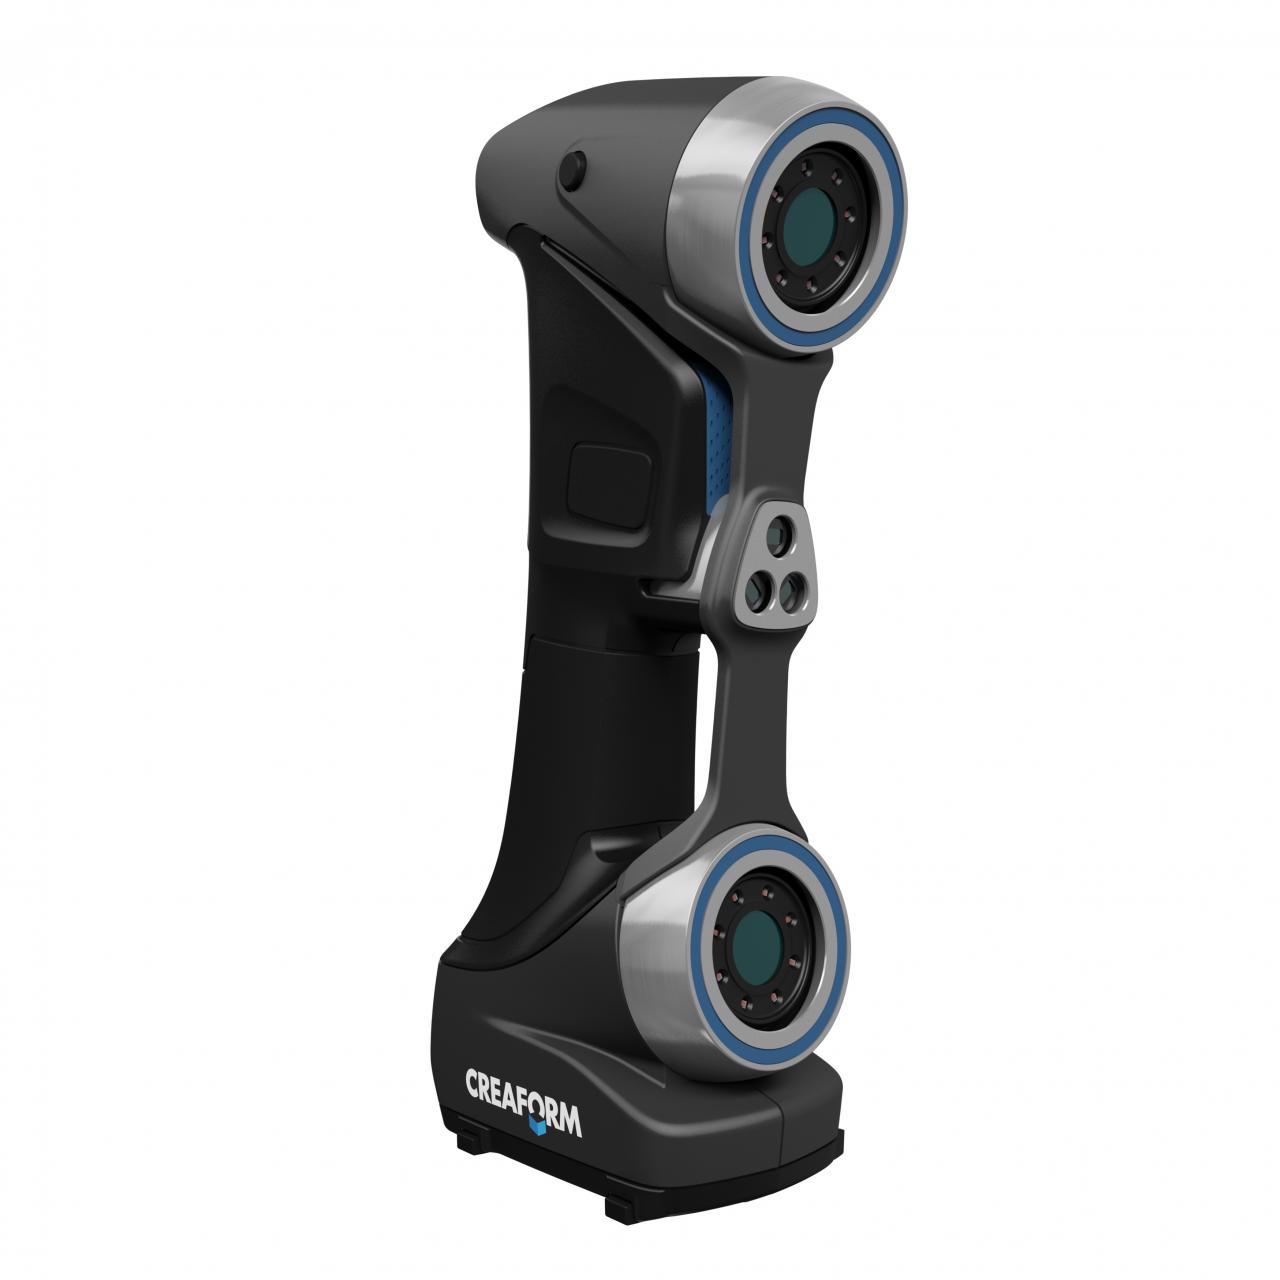 HandySCAN 3D - 휴대용 3D 레이저 스캐너